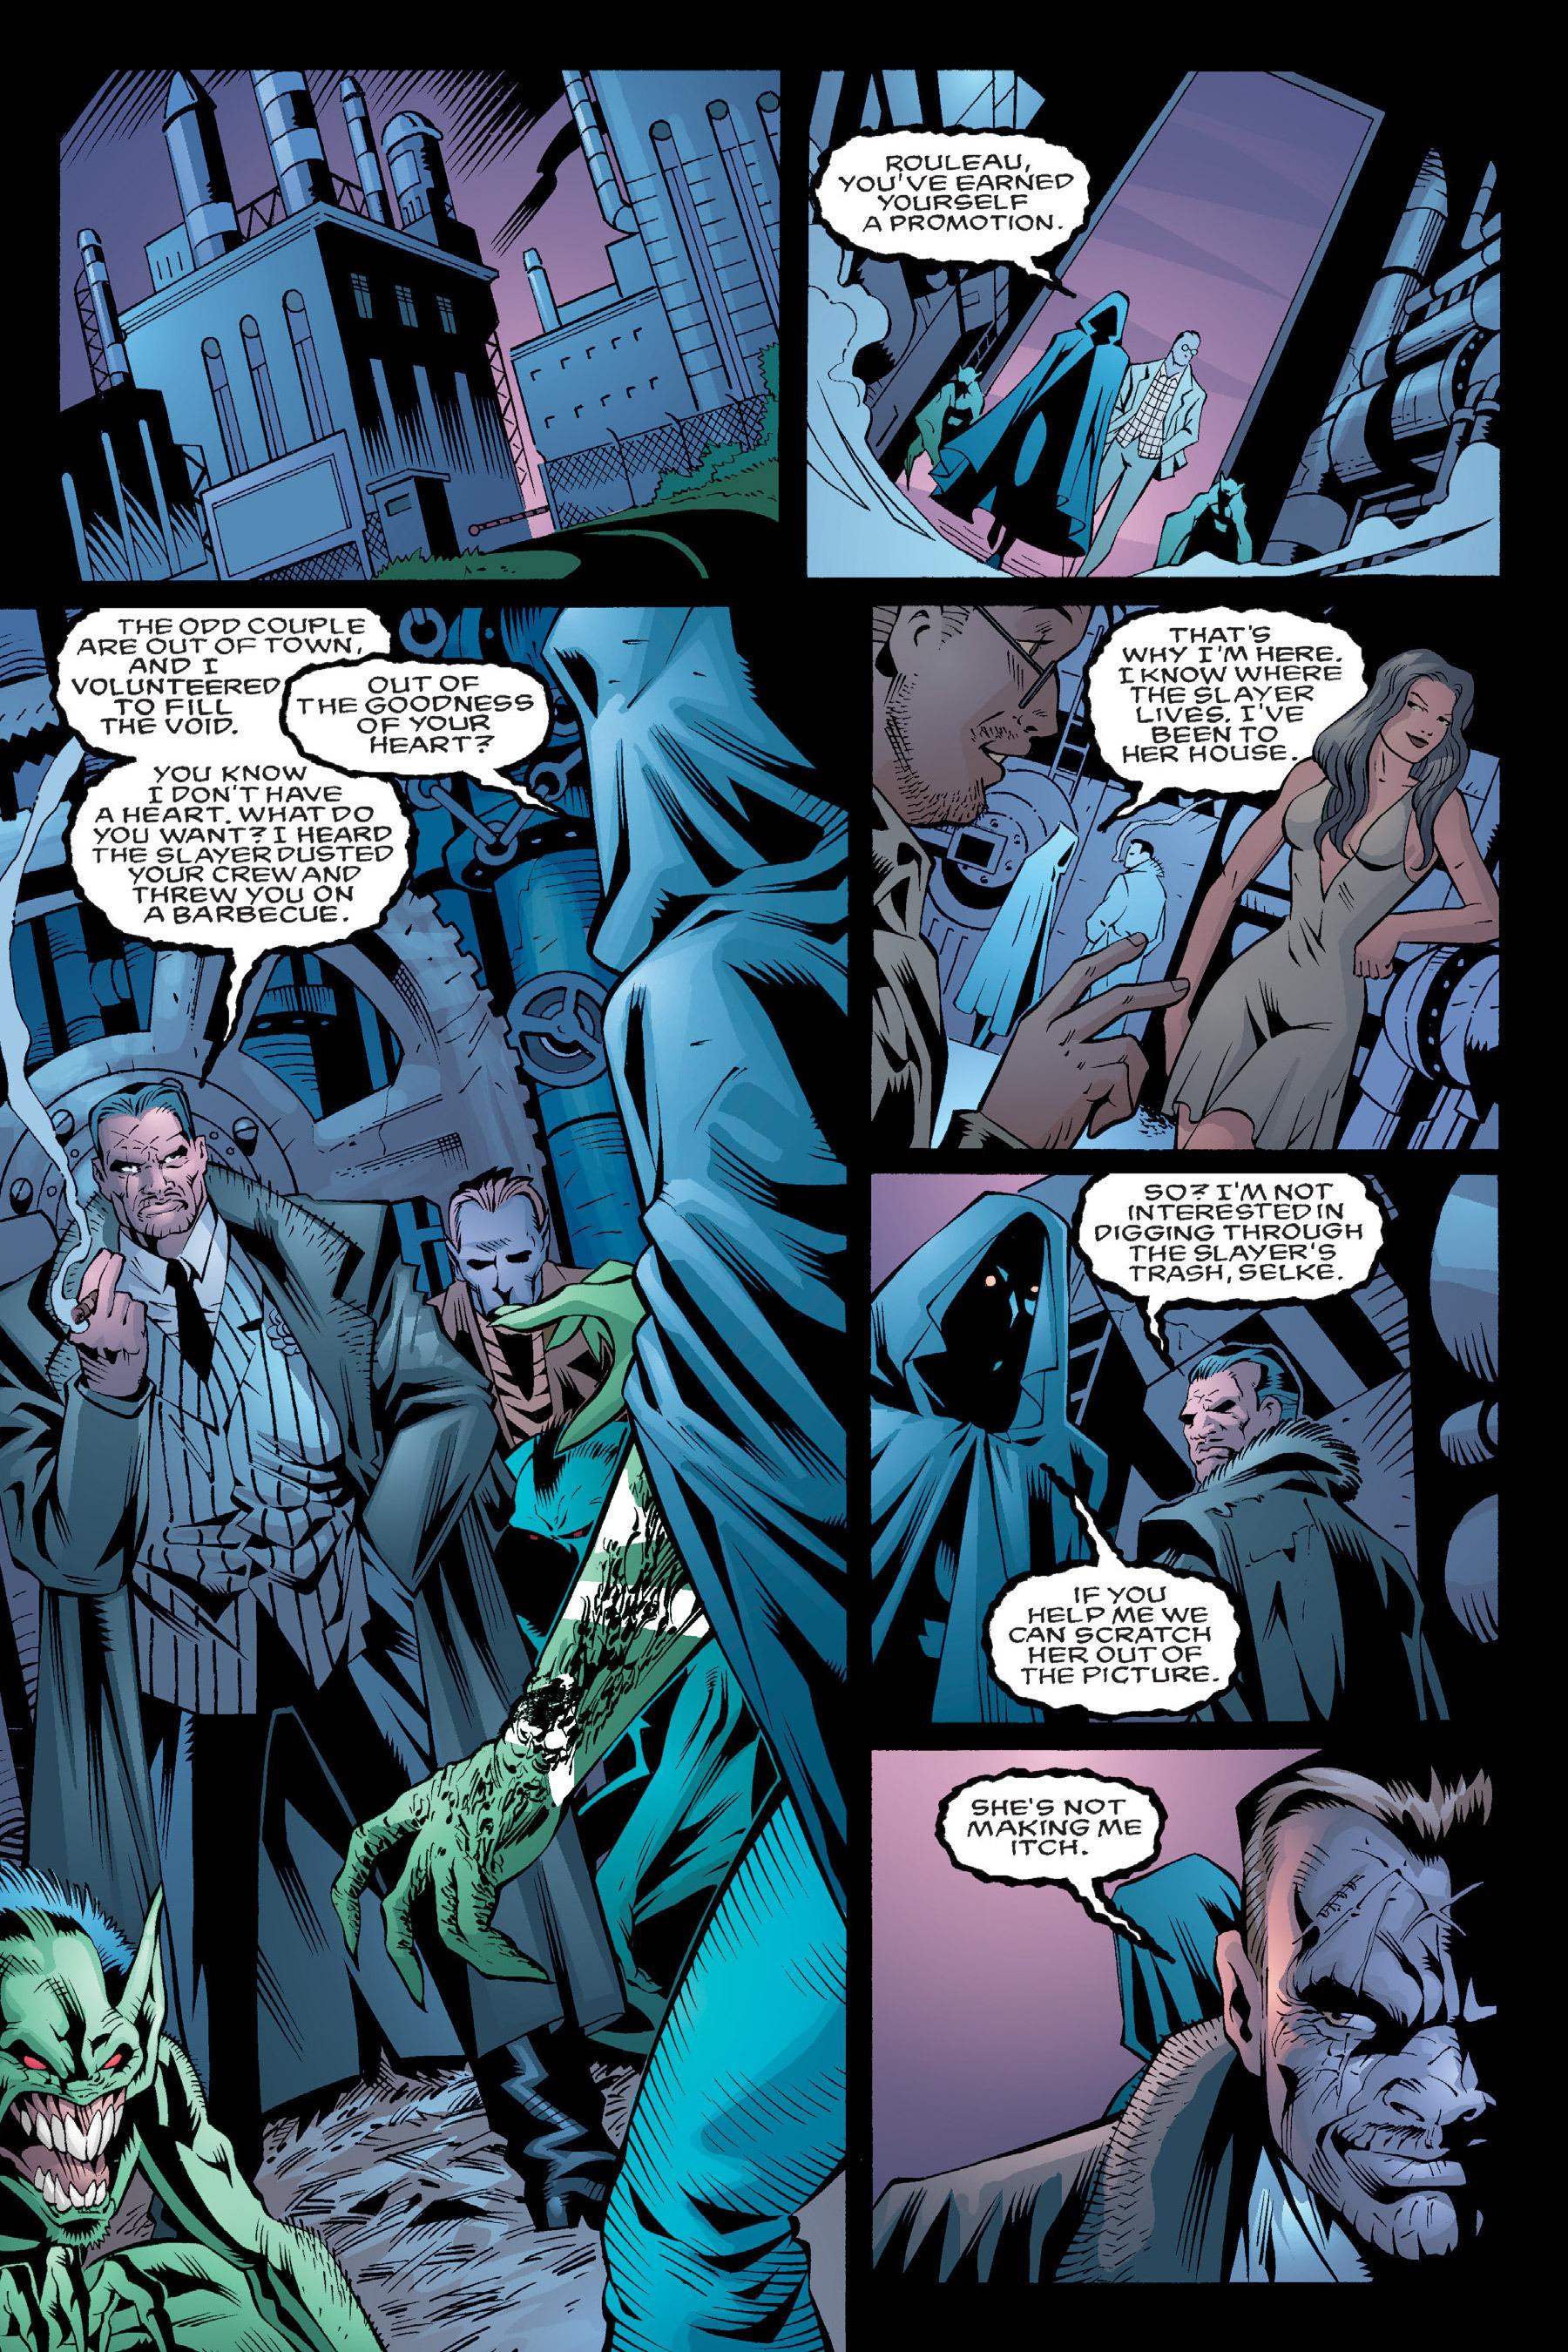 Read online Buffy the Vampire Slayer: Omnibus comic -  Issue # TPB 4 - 39